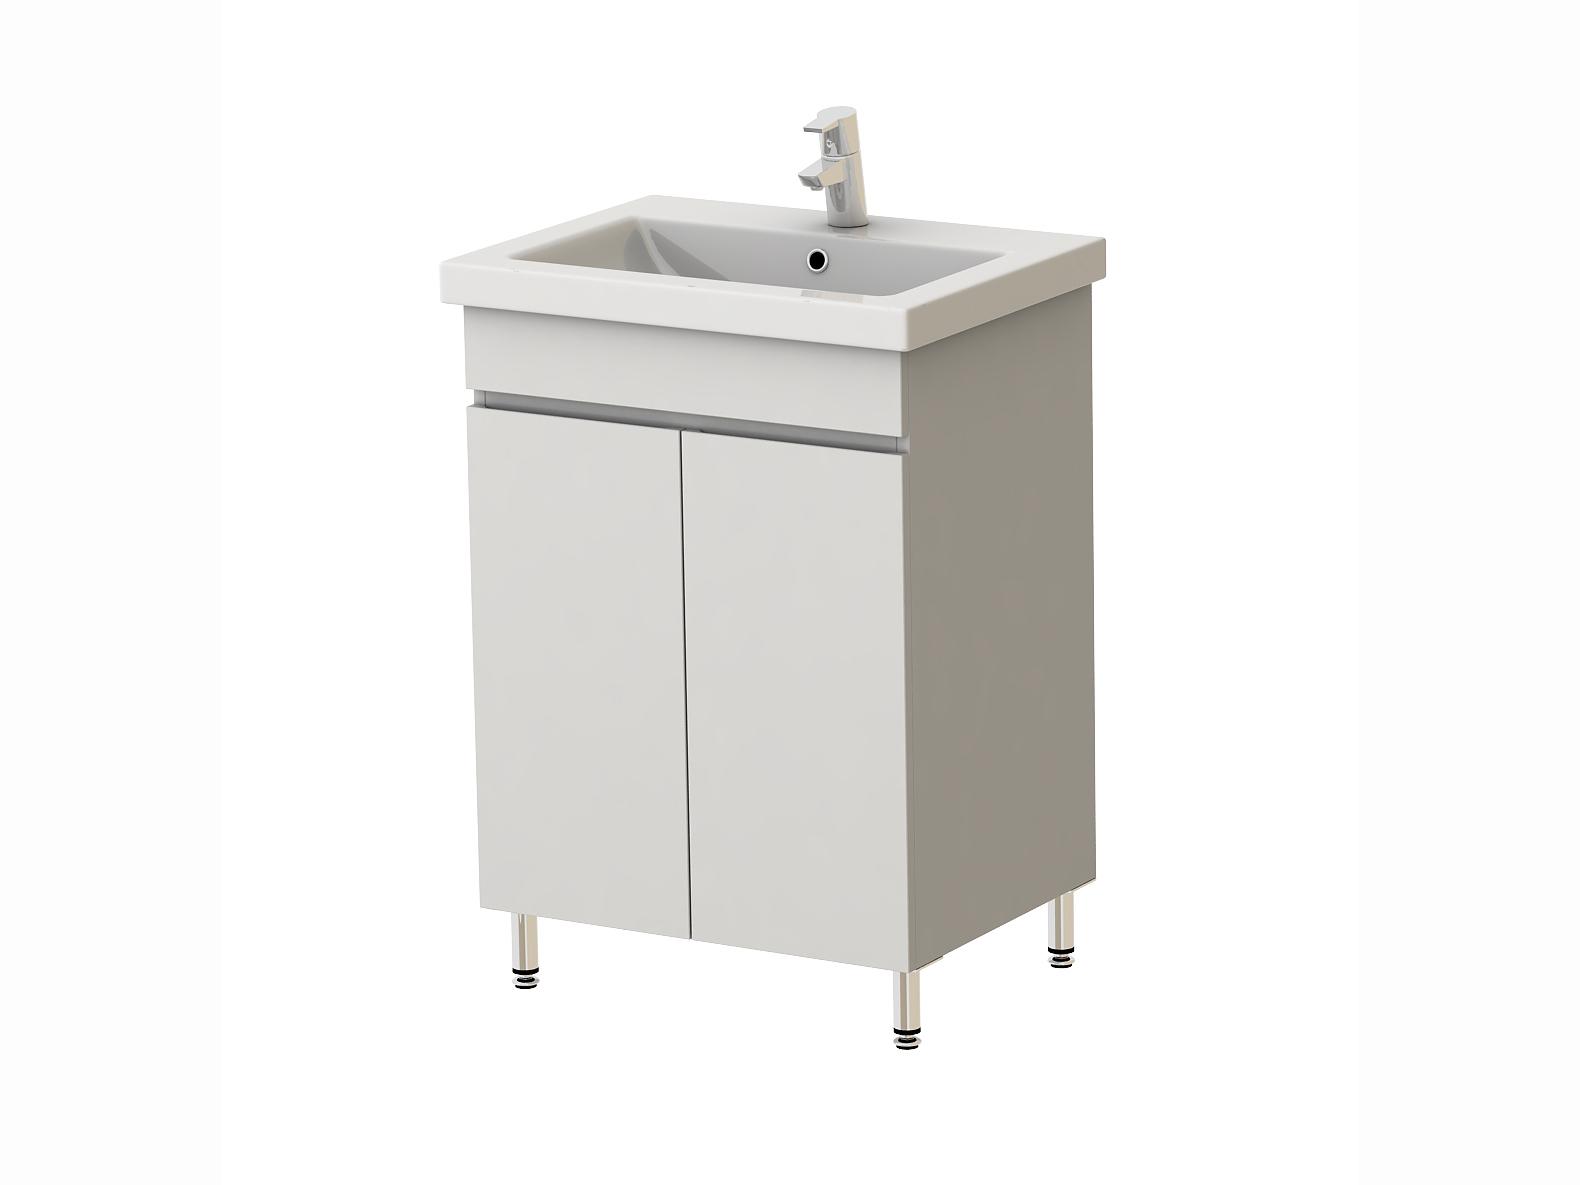 Koupelnová skříňka s umyvadlem - Juventa - Ariadna - Ar2-60 W